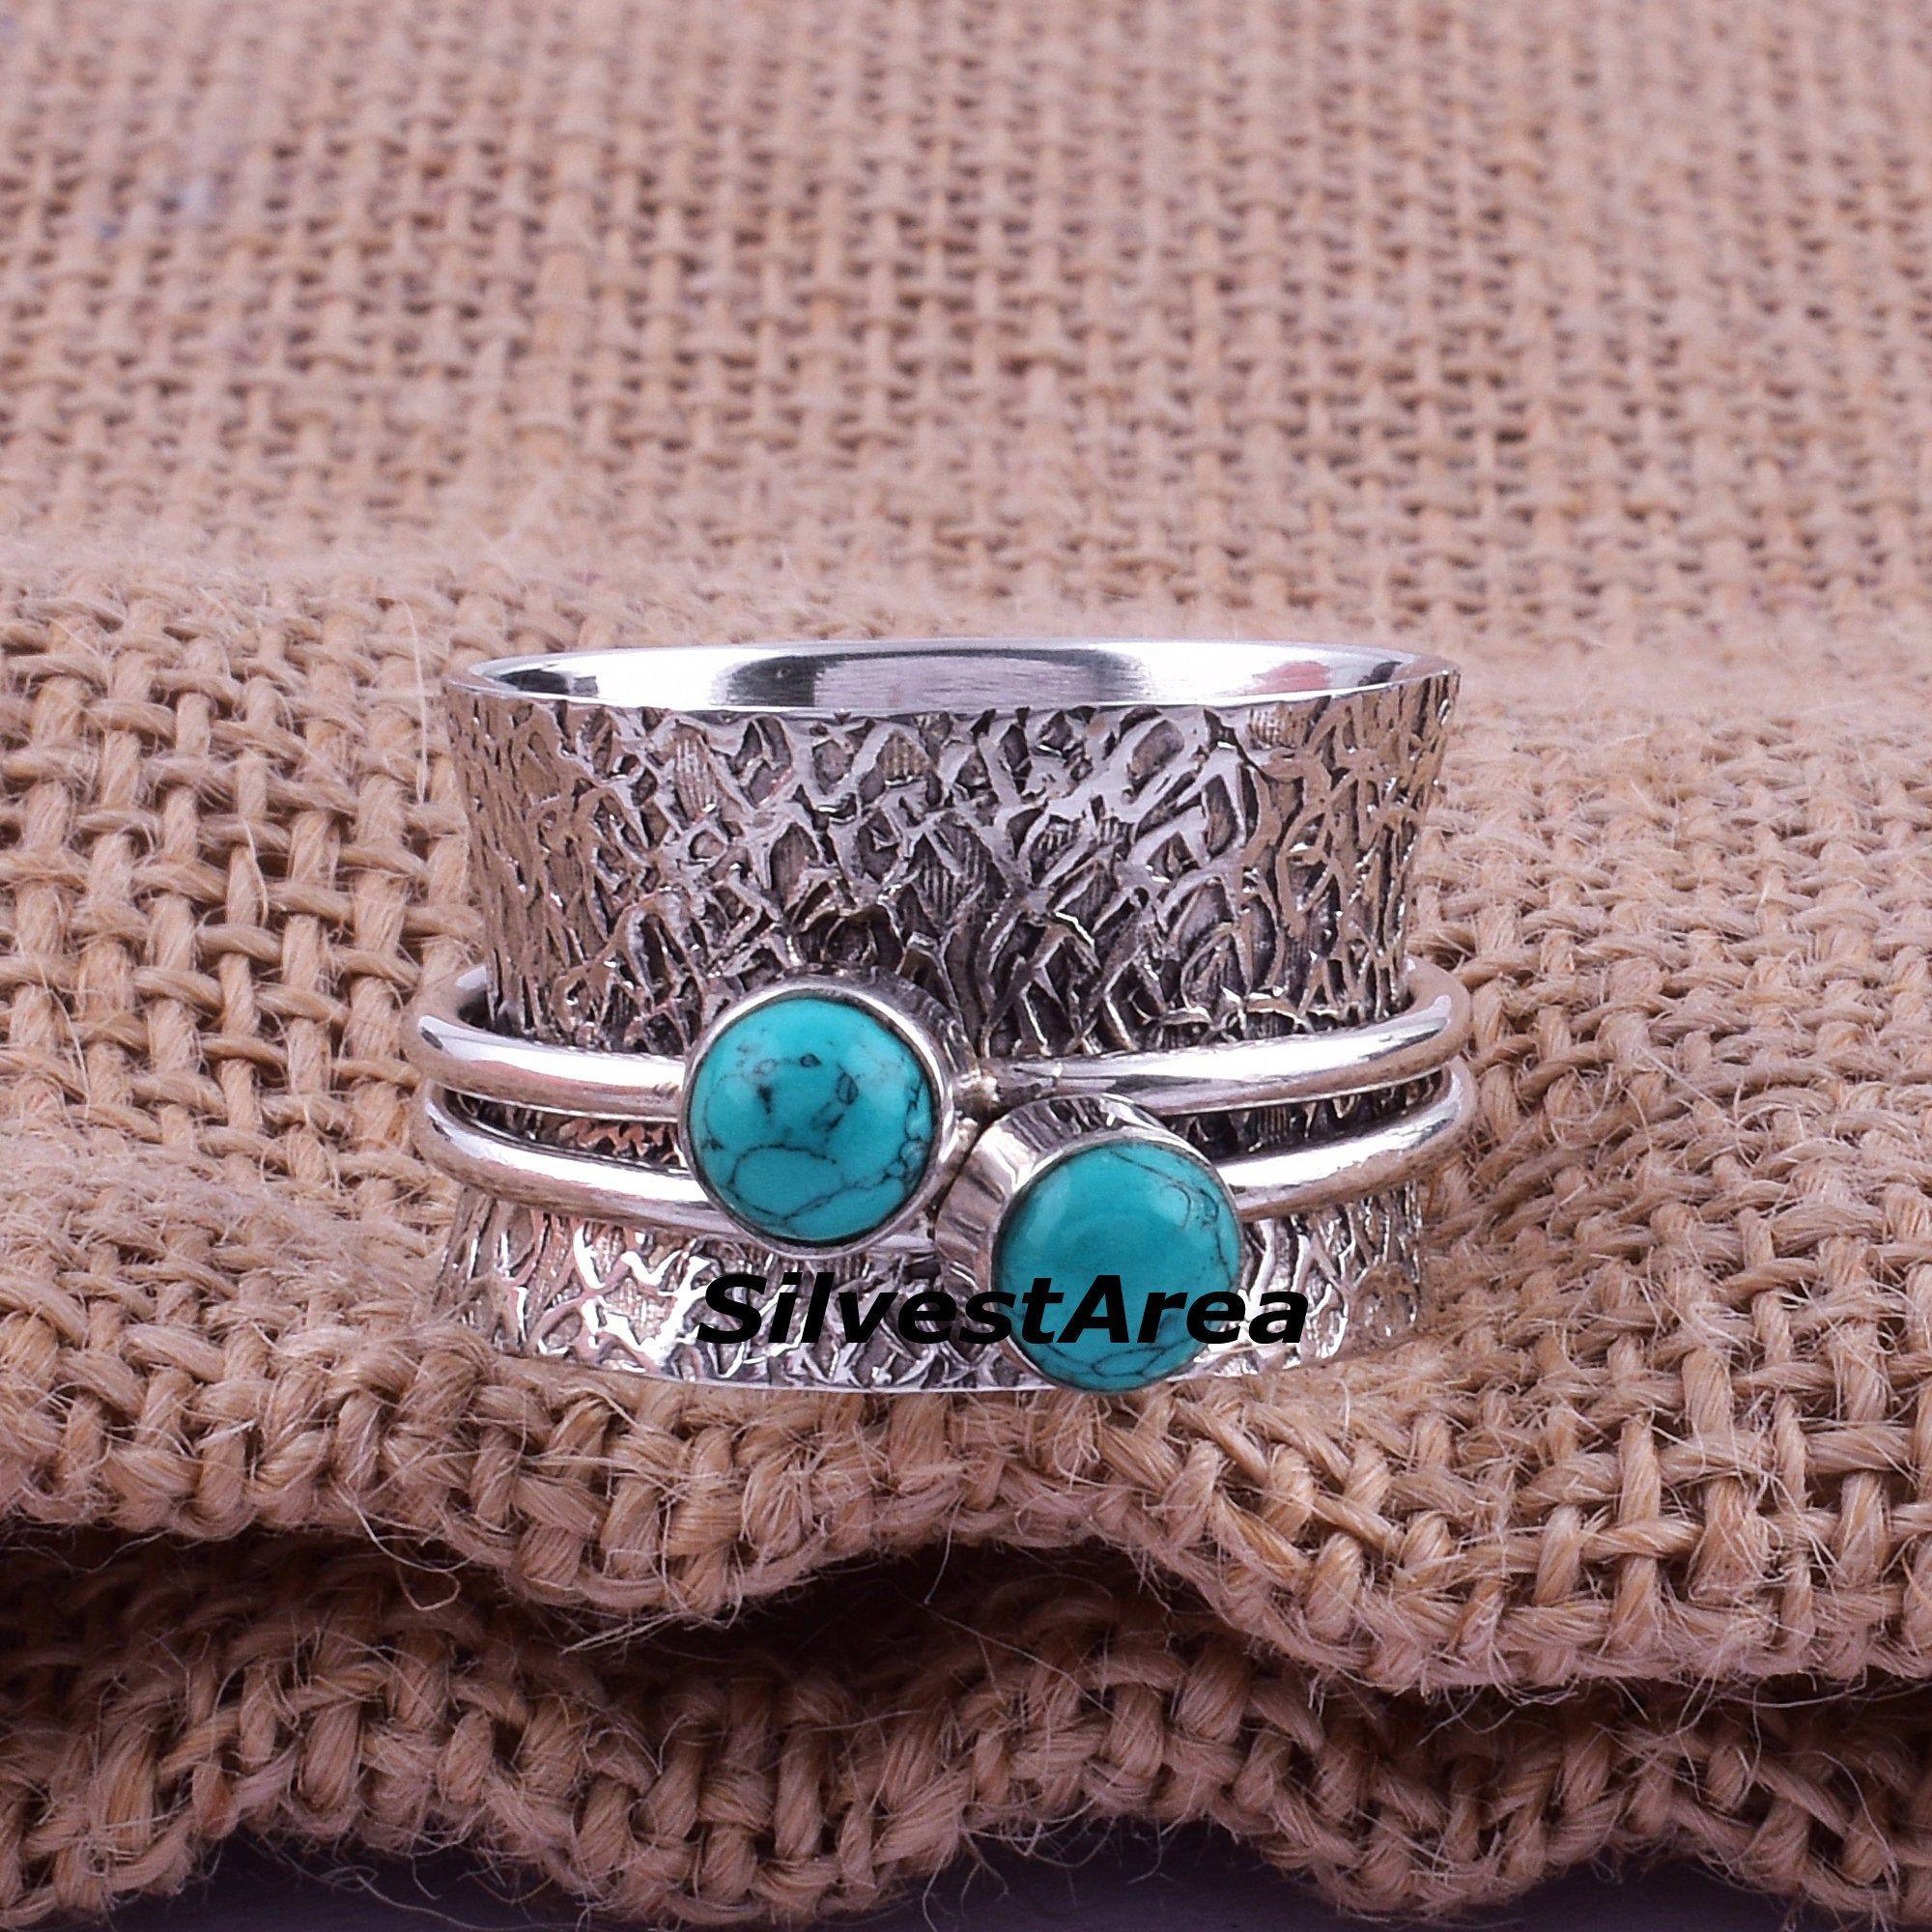 Gemstone Ring Silver jewelry Labradorite Spinner ring spinning ring Meditation ring,Fidget ring,Handmade Silver ring,Spinner band